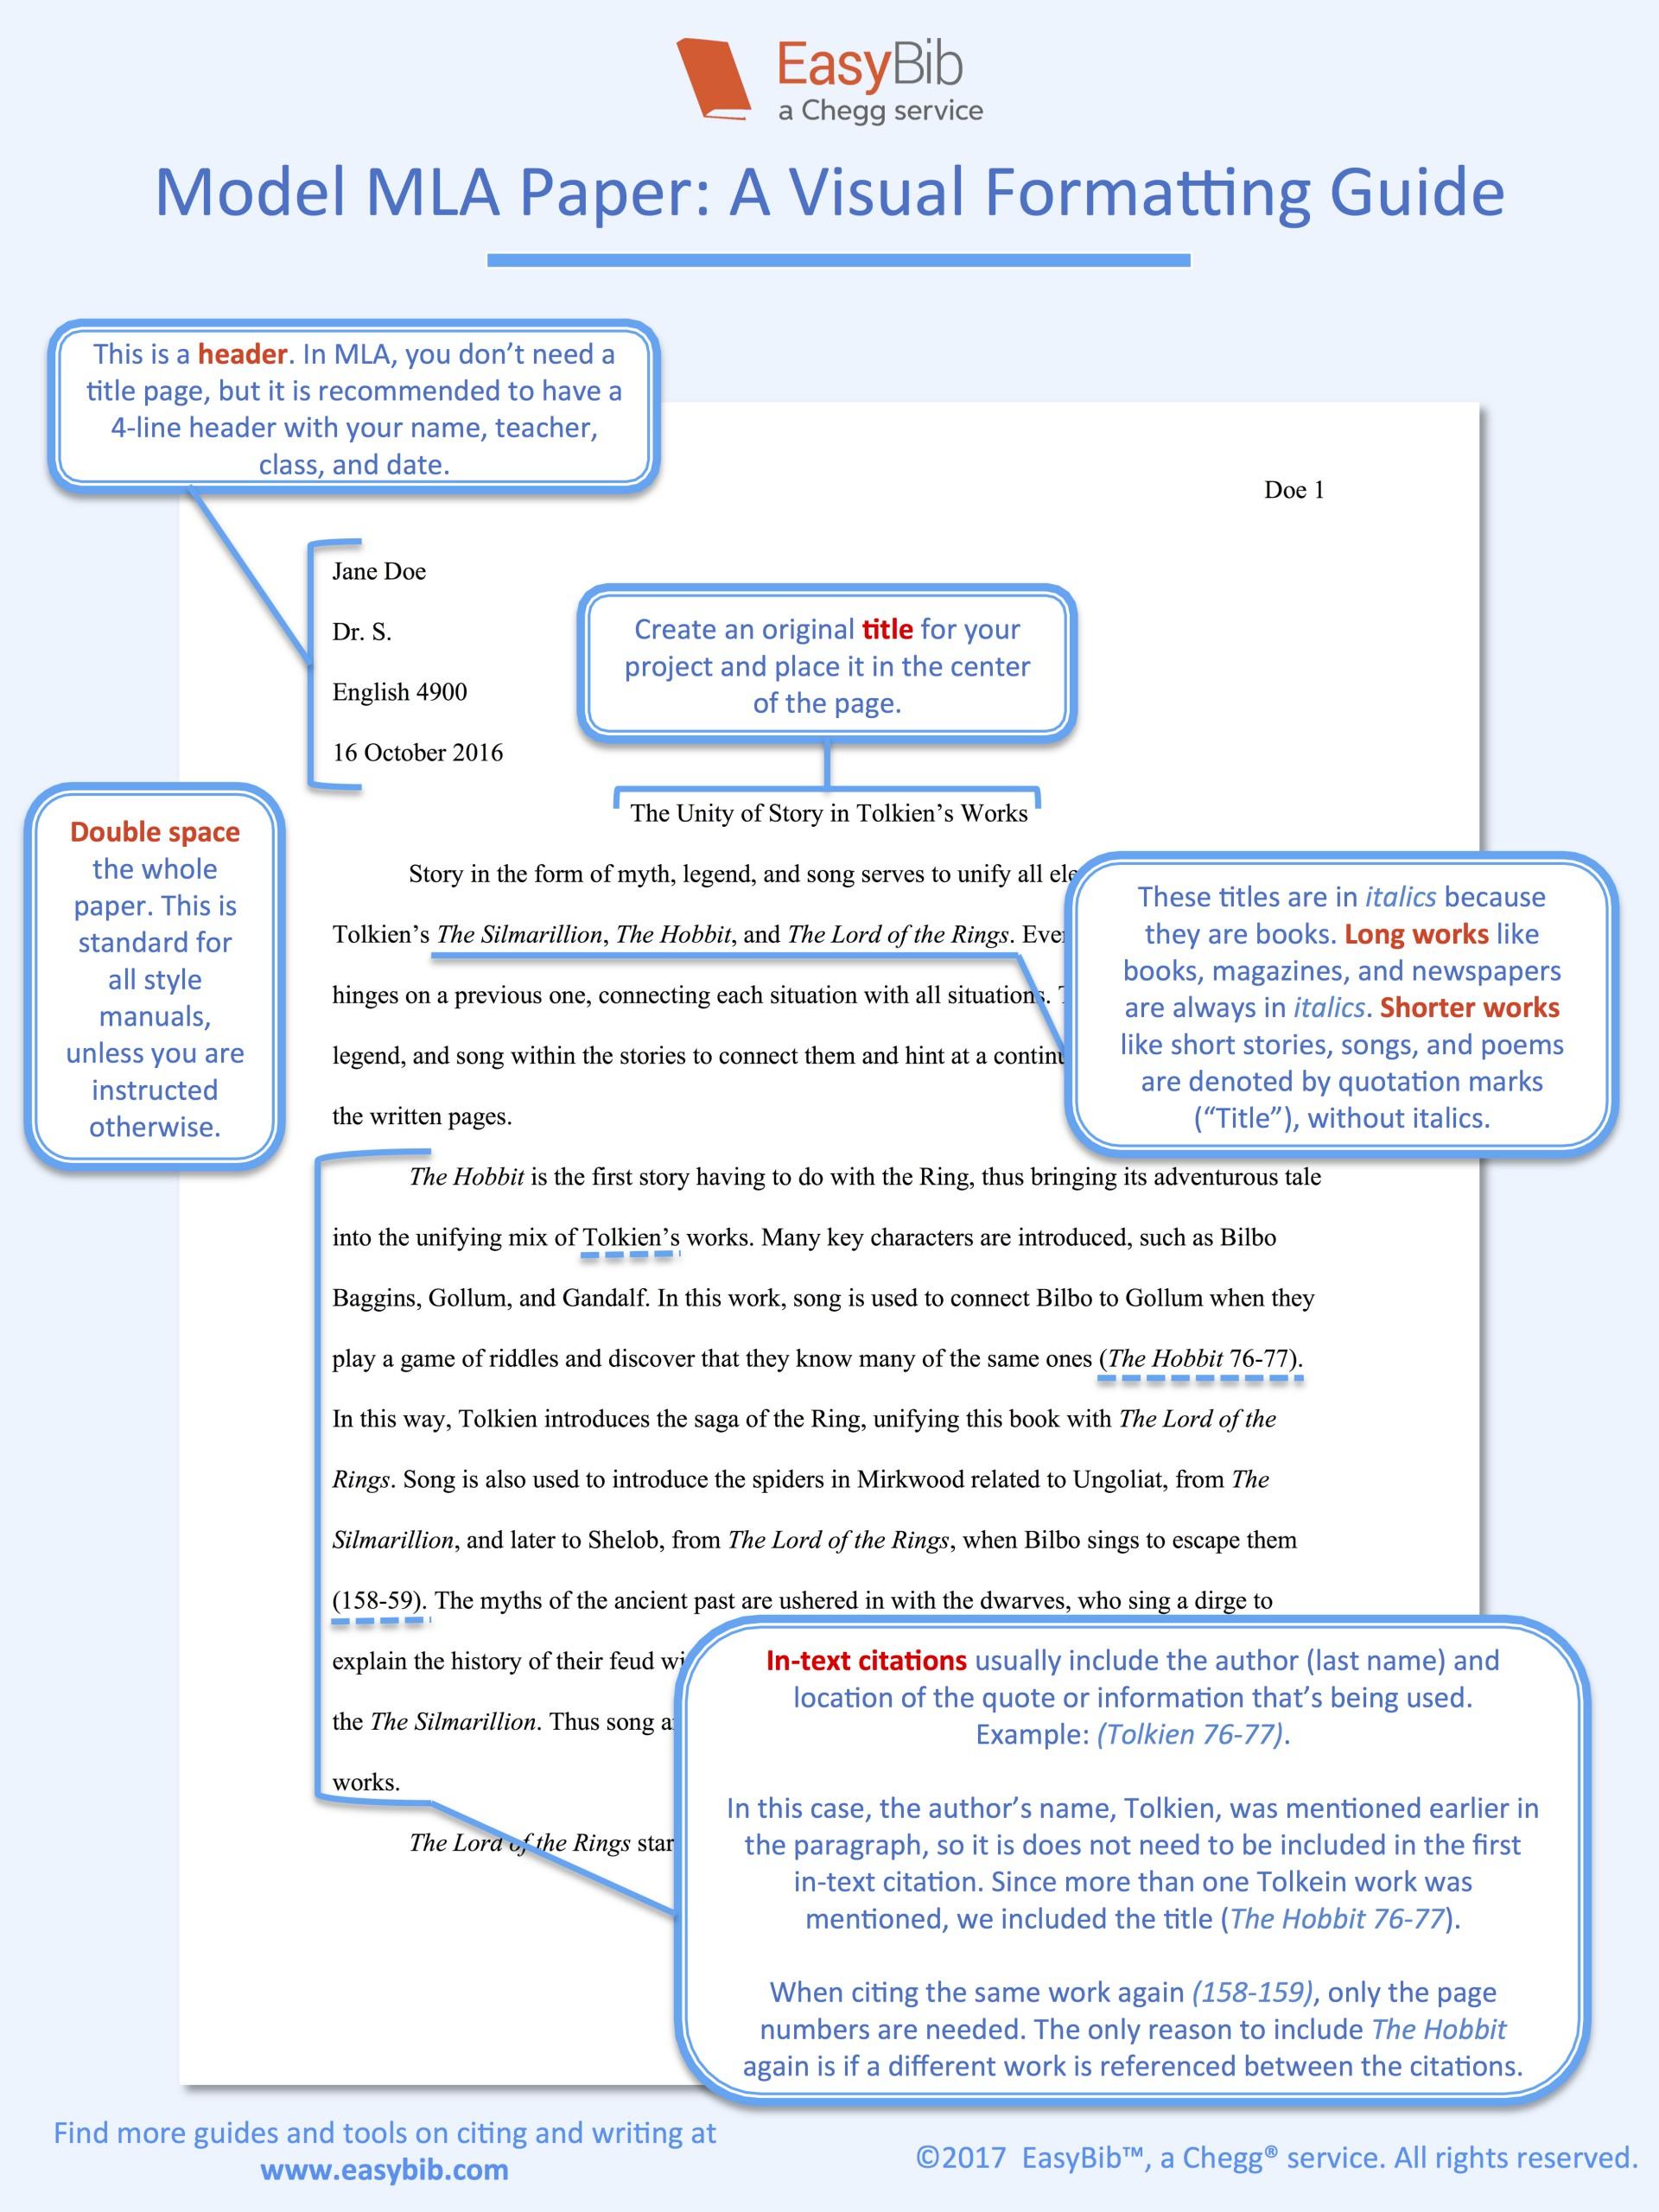 002 Essay Bib Model Mla Paper Fearsome Easybib Works Cited Chicago Citation Generator Apa Format 1920